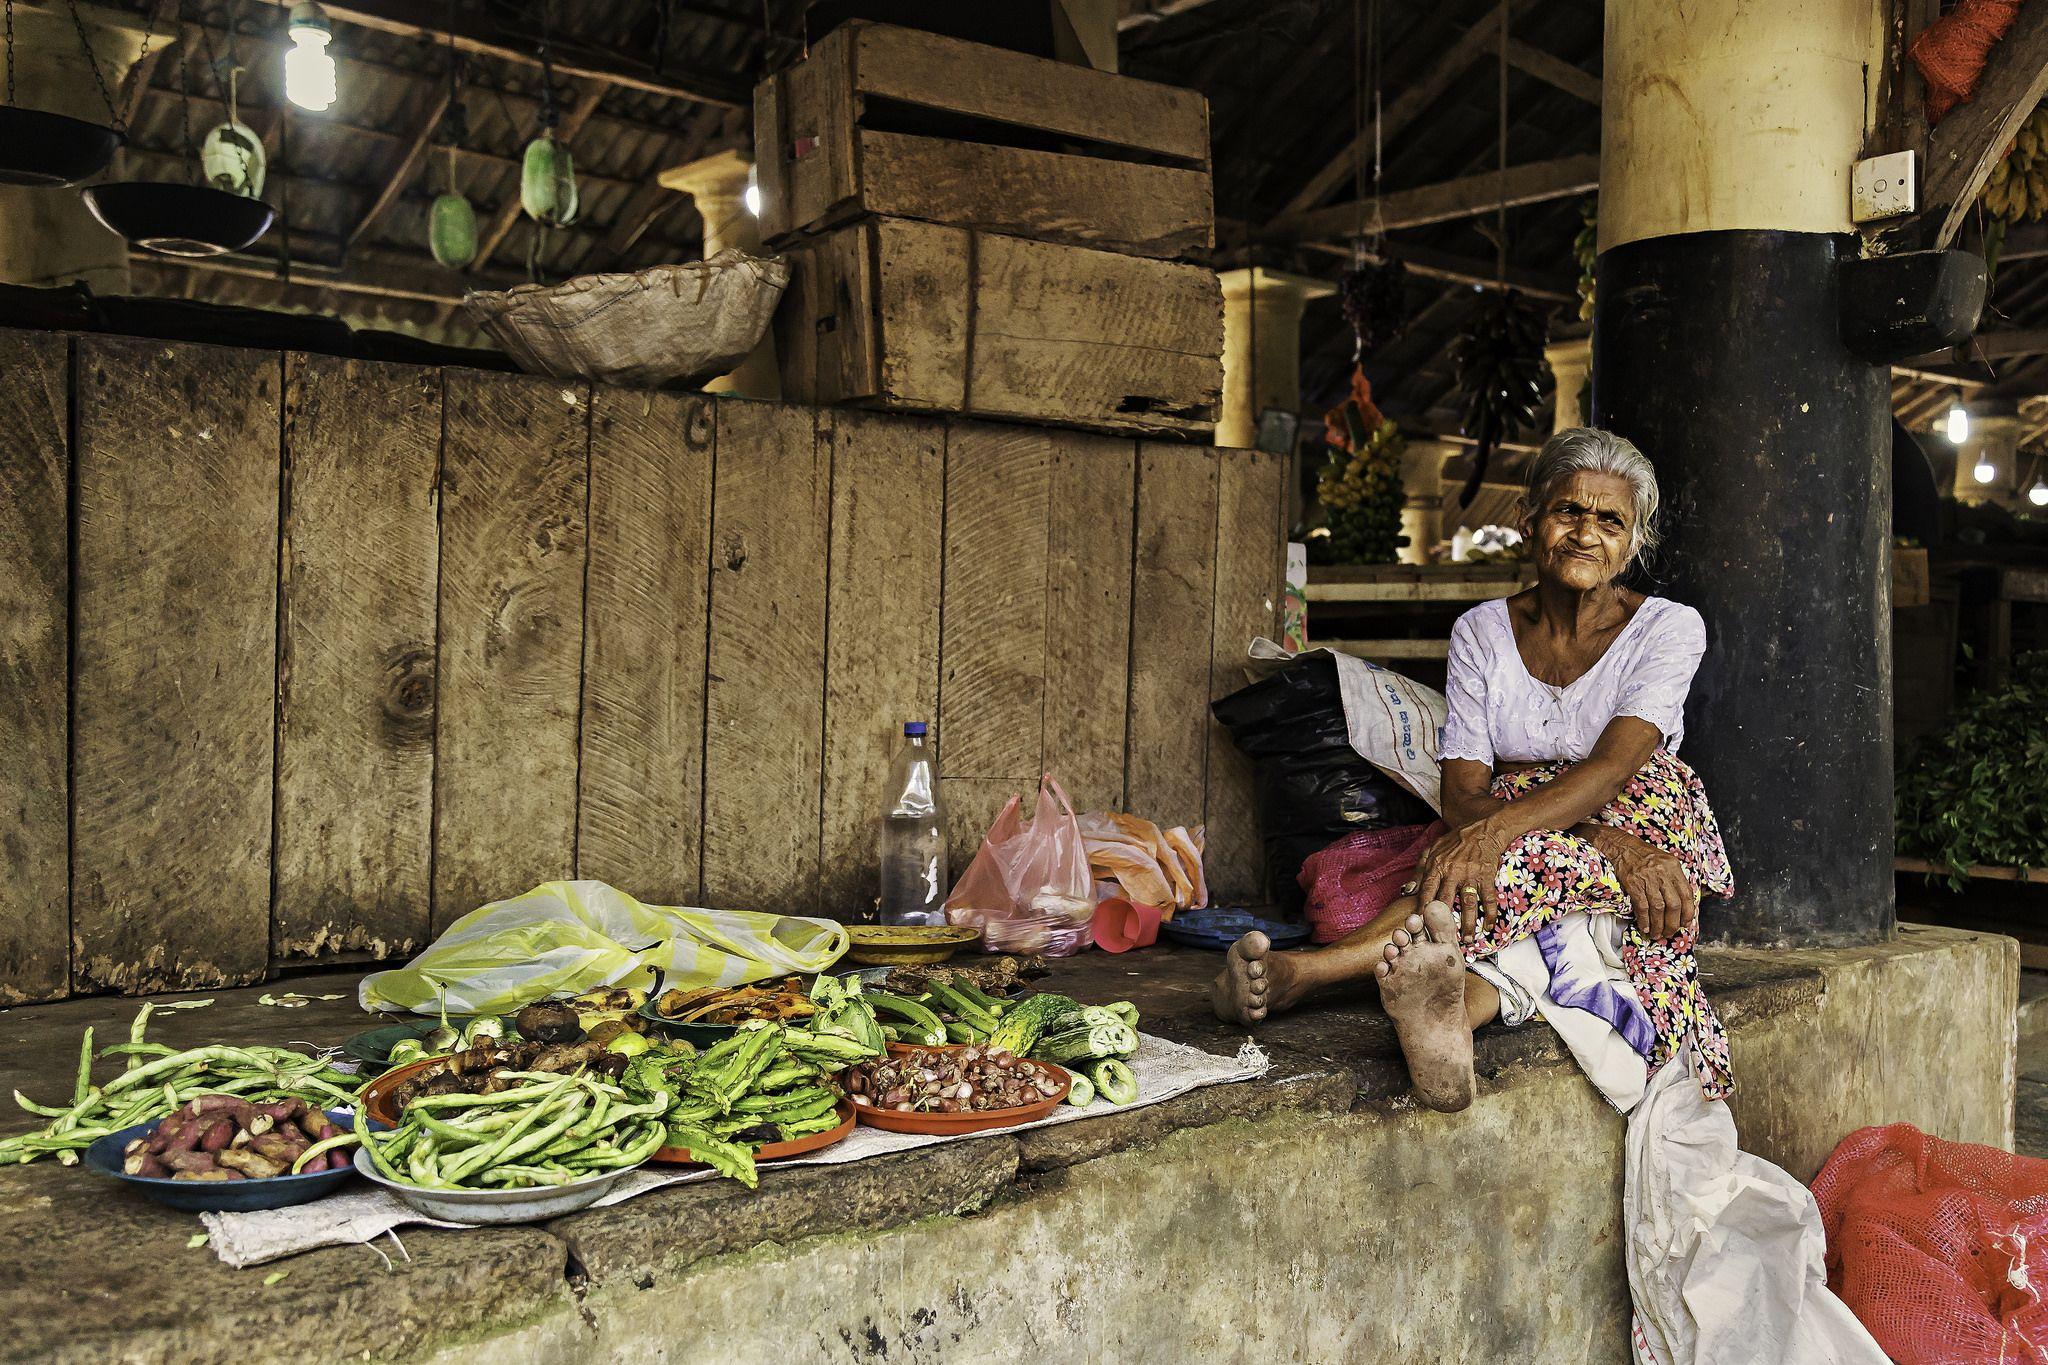 The Saleswoman Barefoot Sri Lanka Sri Lankan Barefoot